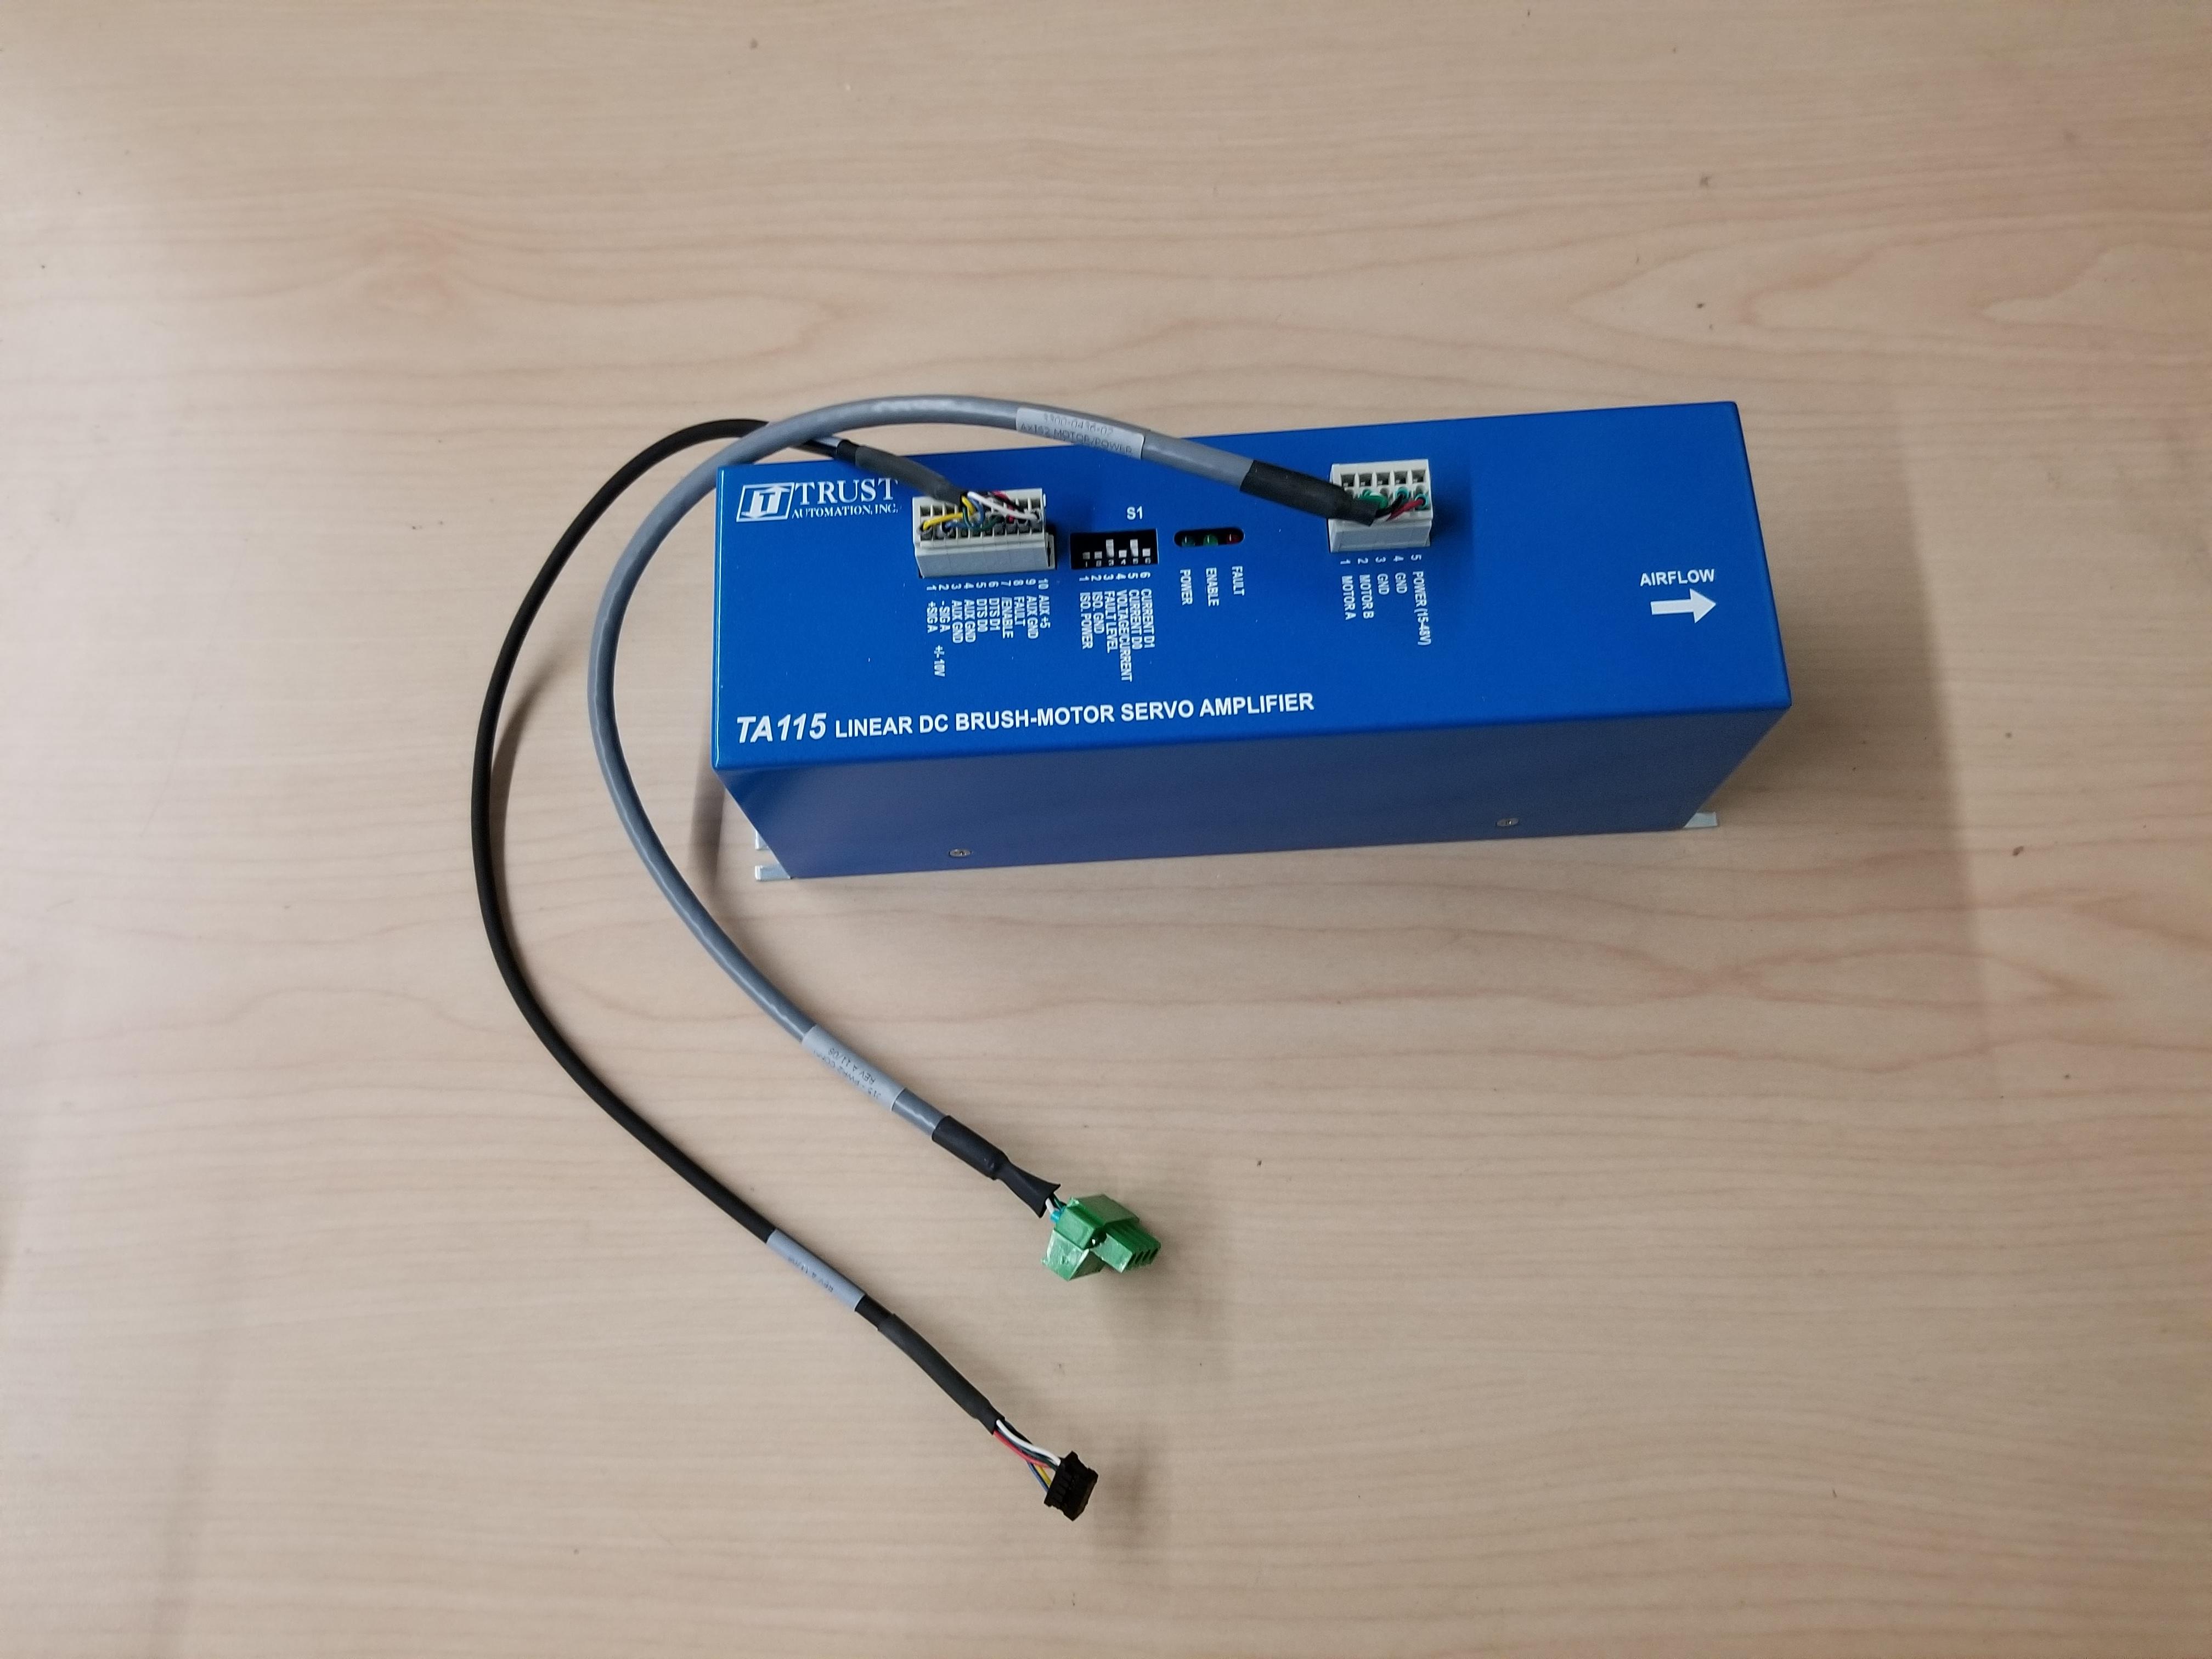 Trust Automation Linear DC Brush Motor Servo Amplifier